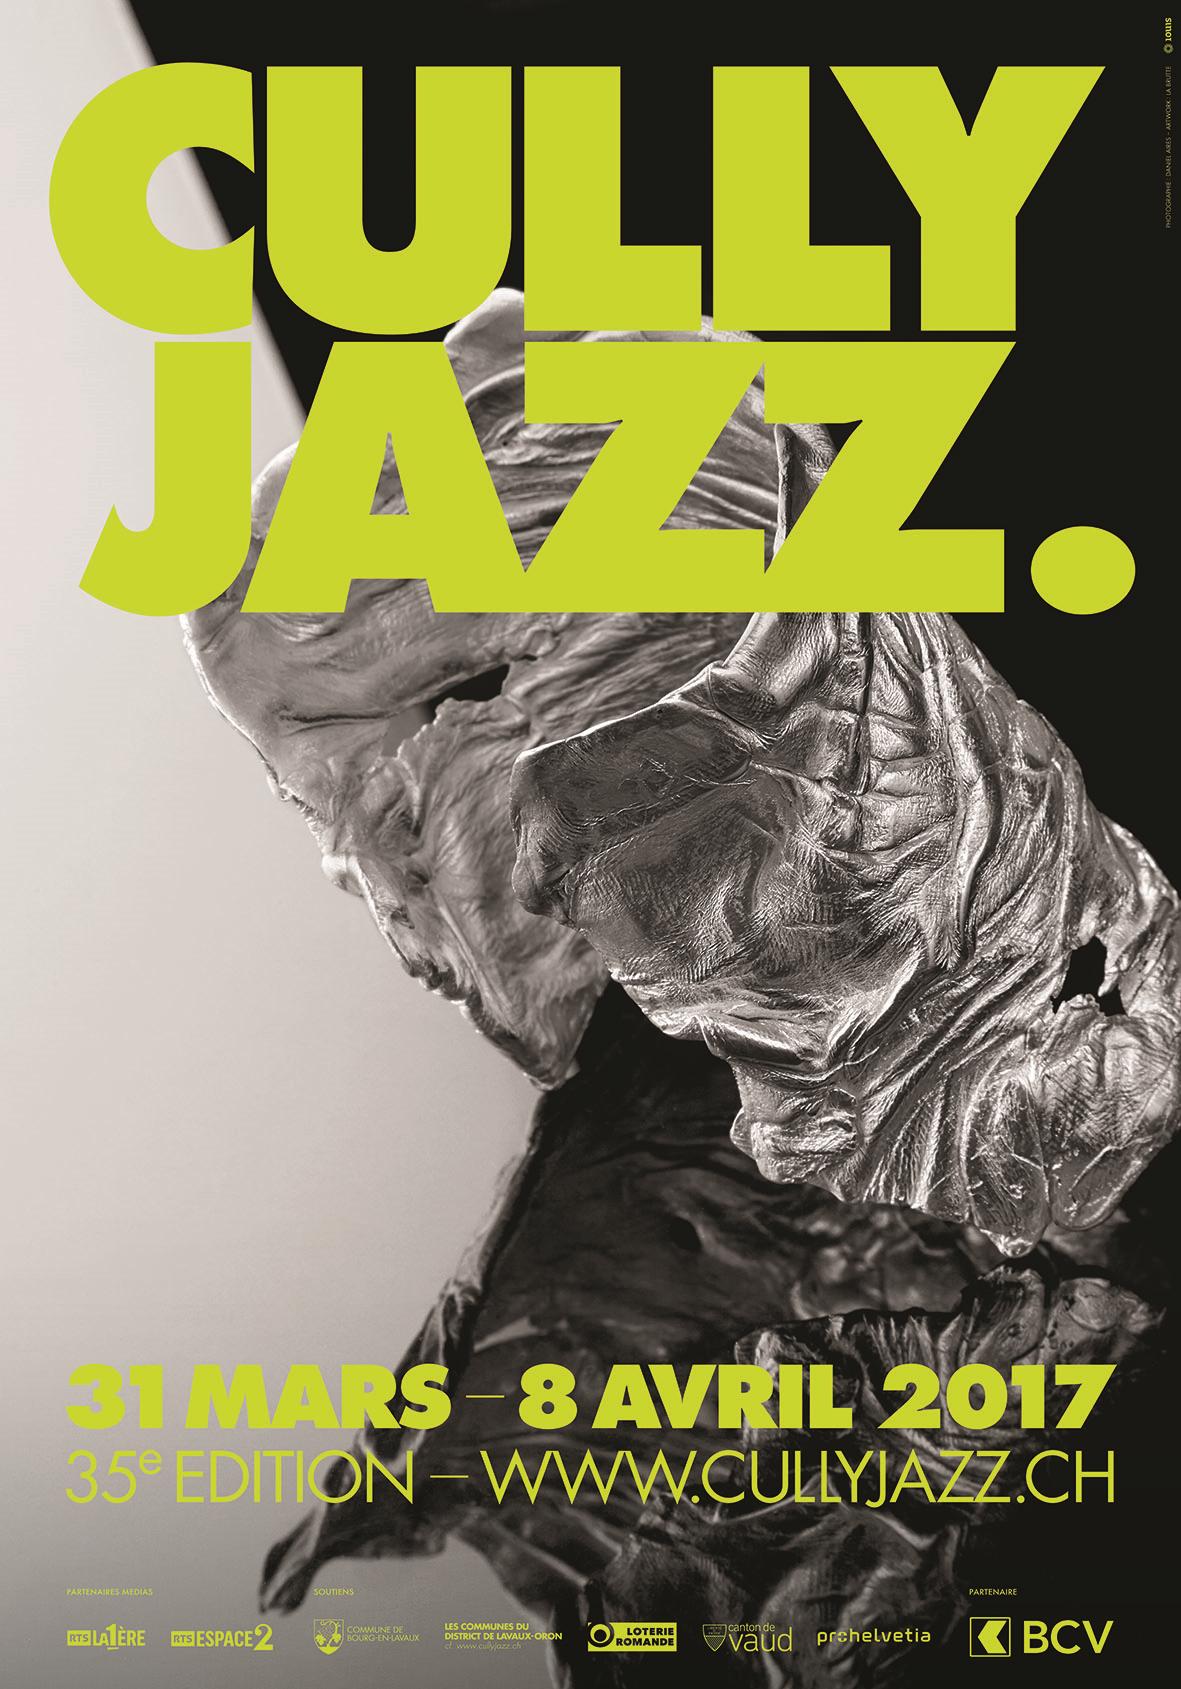 Affiche du Cully Jazz Festival 2017